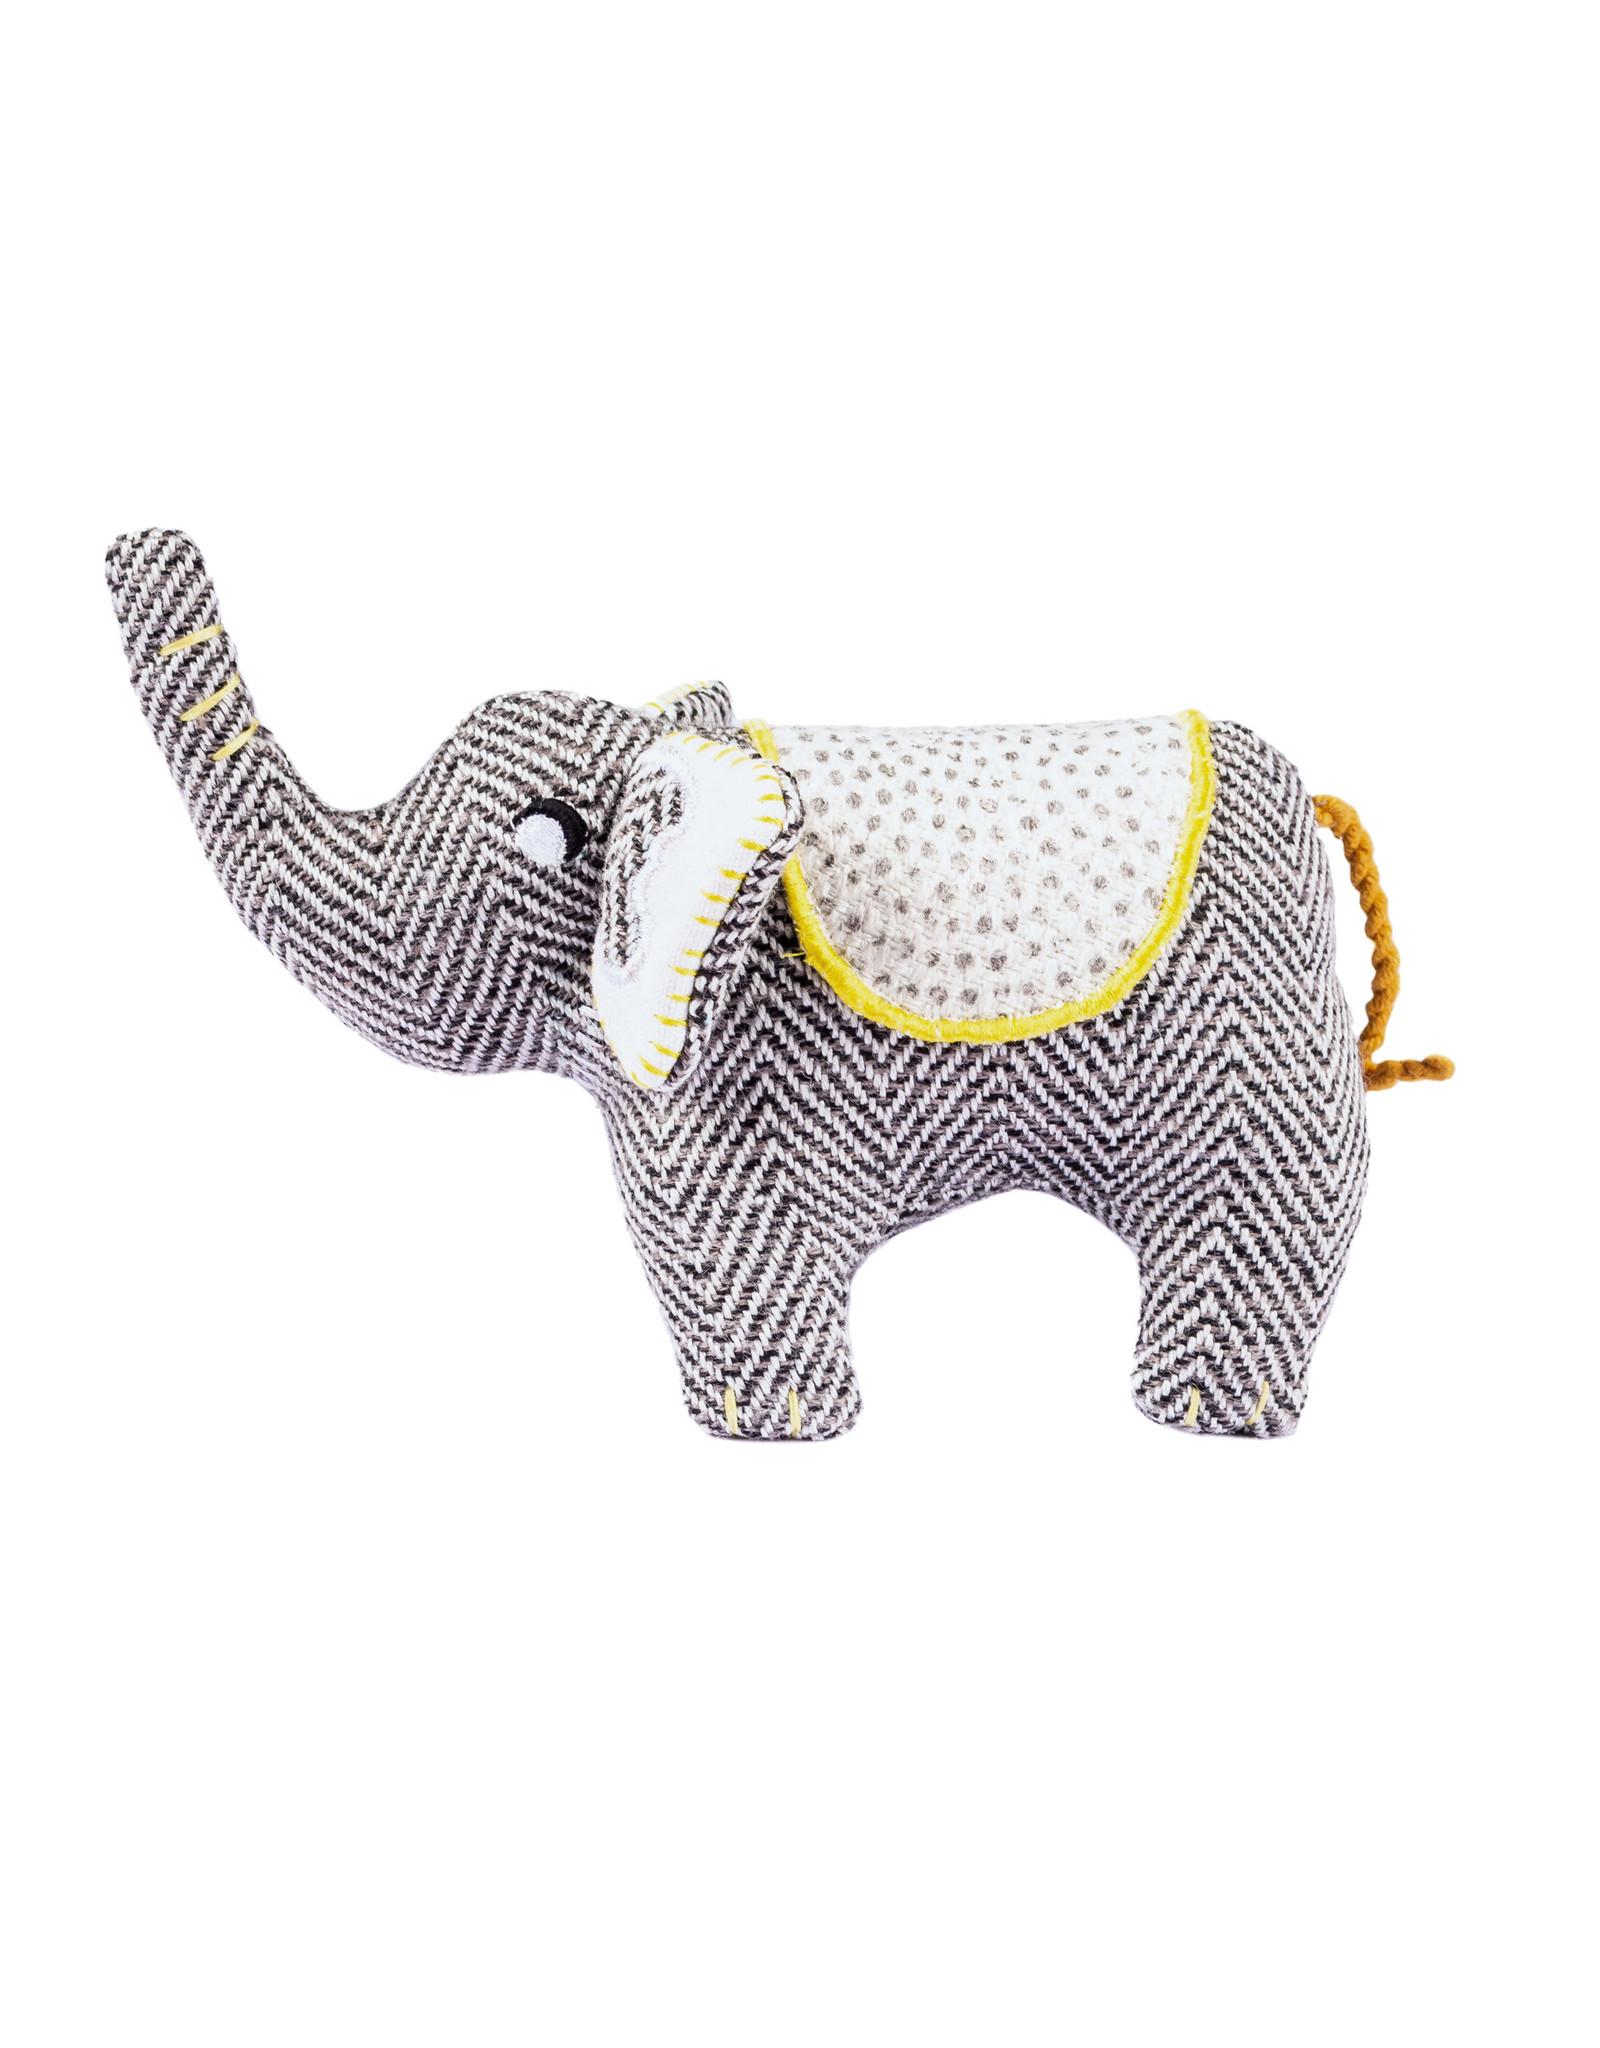 Resploot Resploot Toy - Asian Elephant - Sri Lanka - 22 x 17 cm (9 x 7 in)